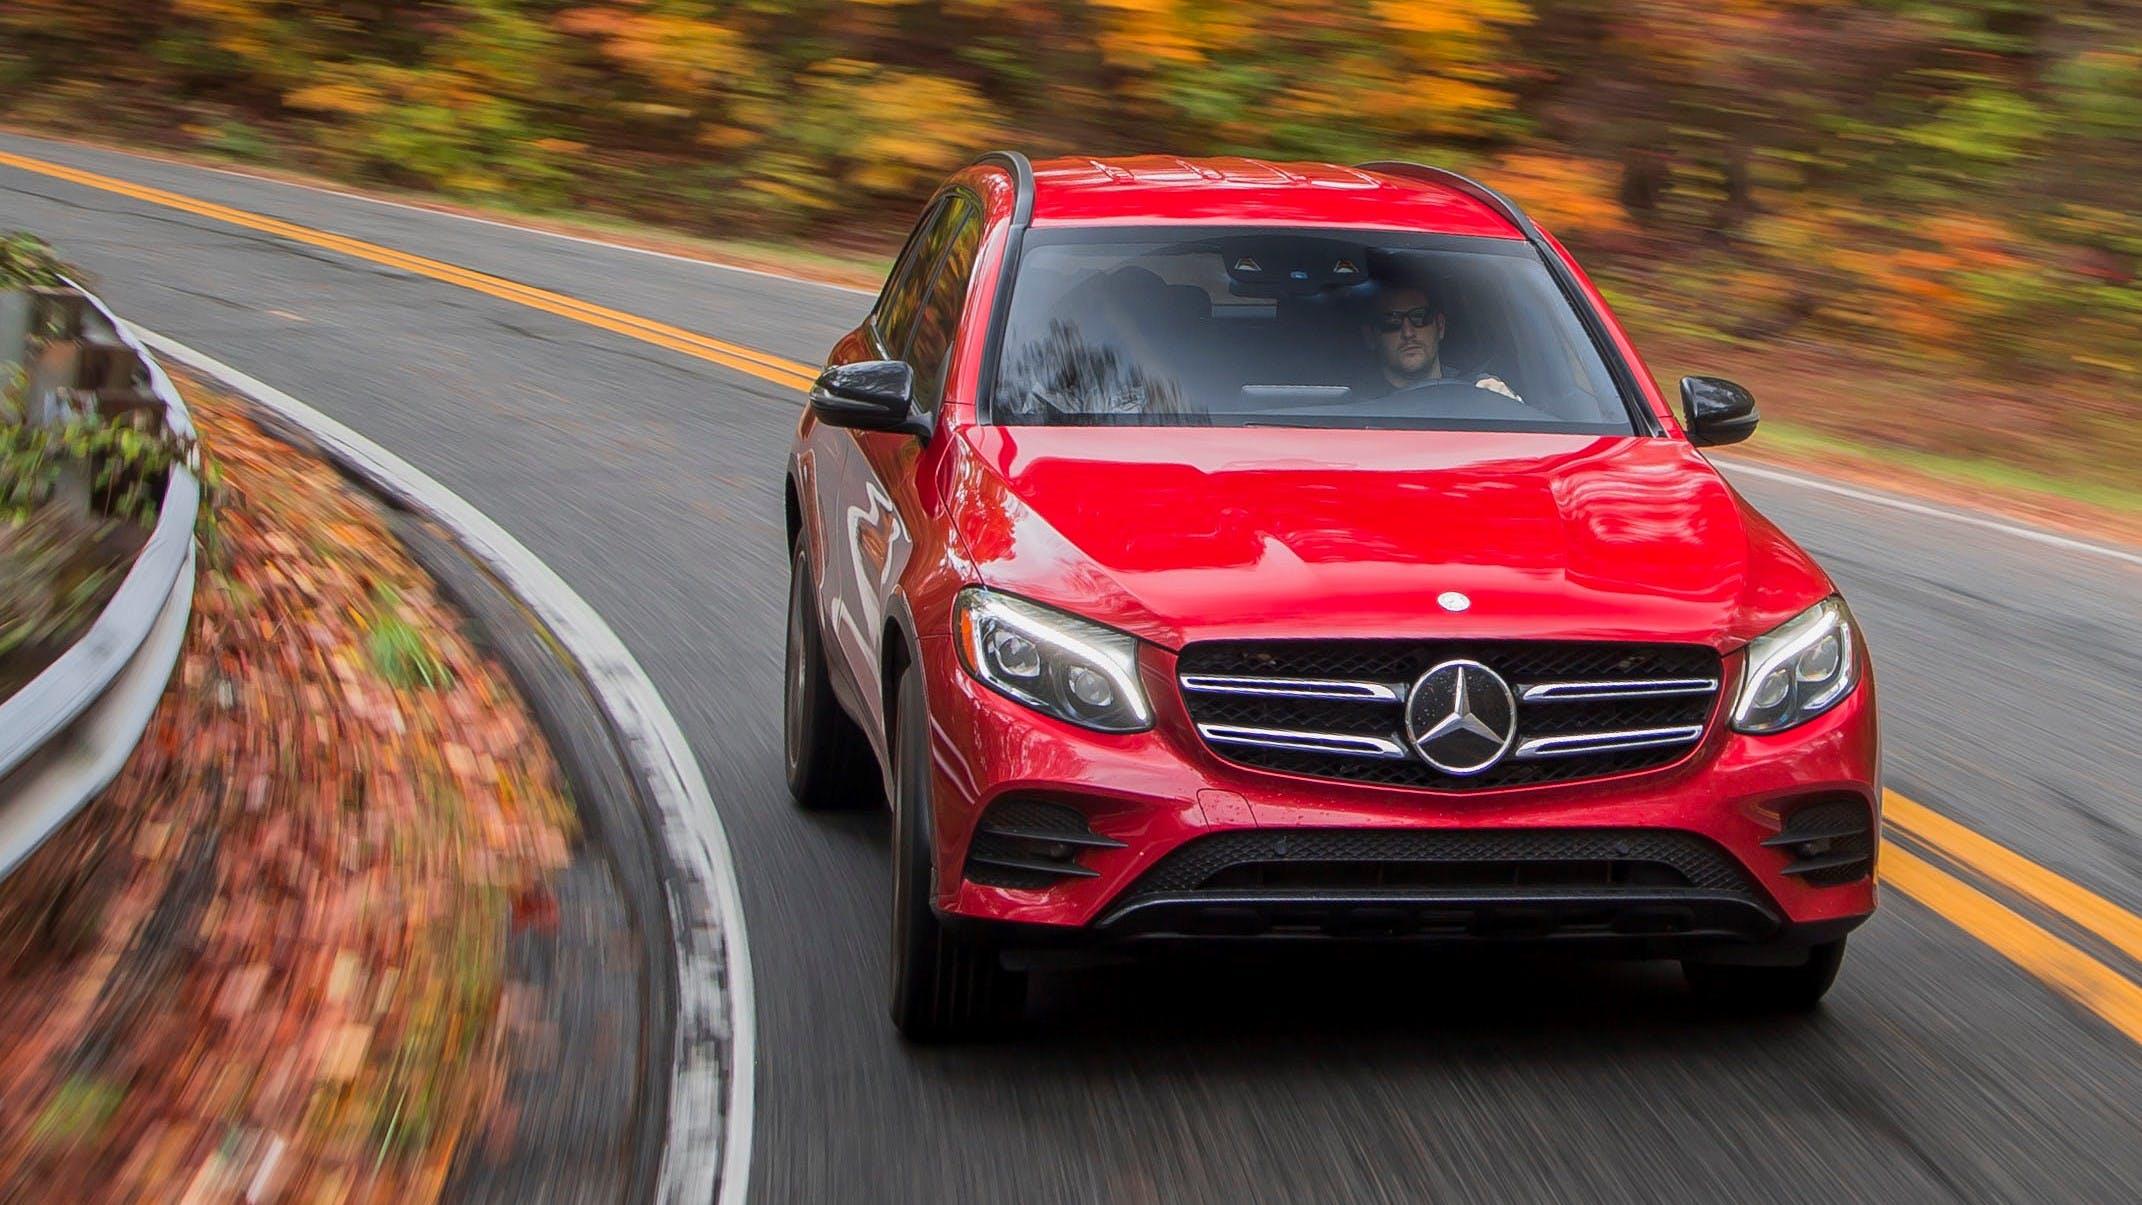 2019 Mercedes-Benz GLC / Photo Credit: Mercedes-Benz